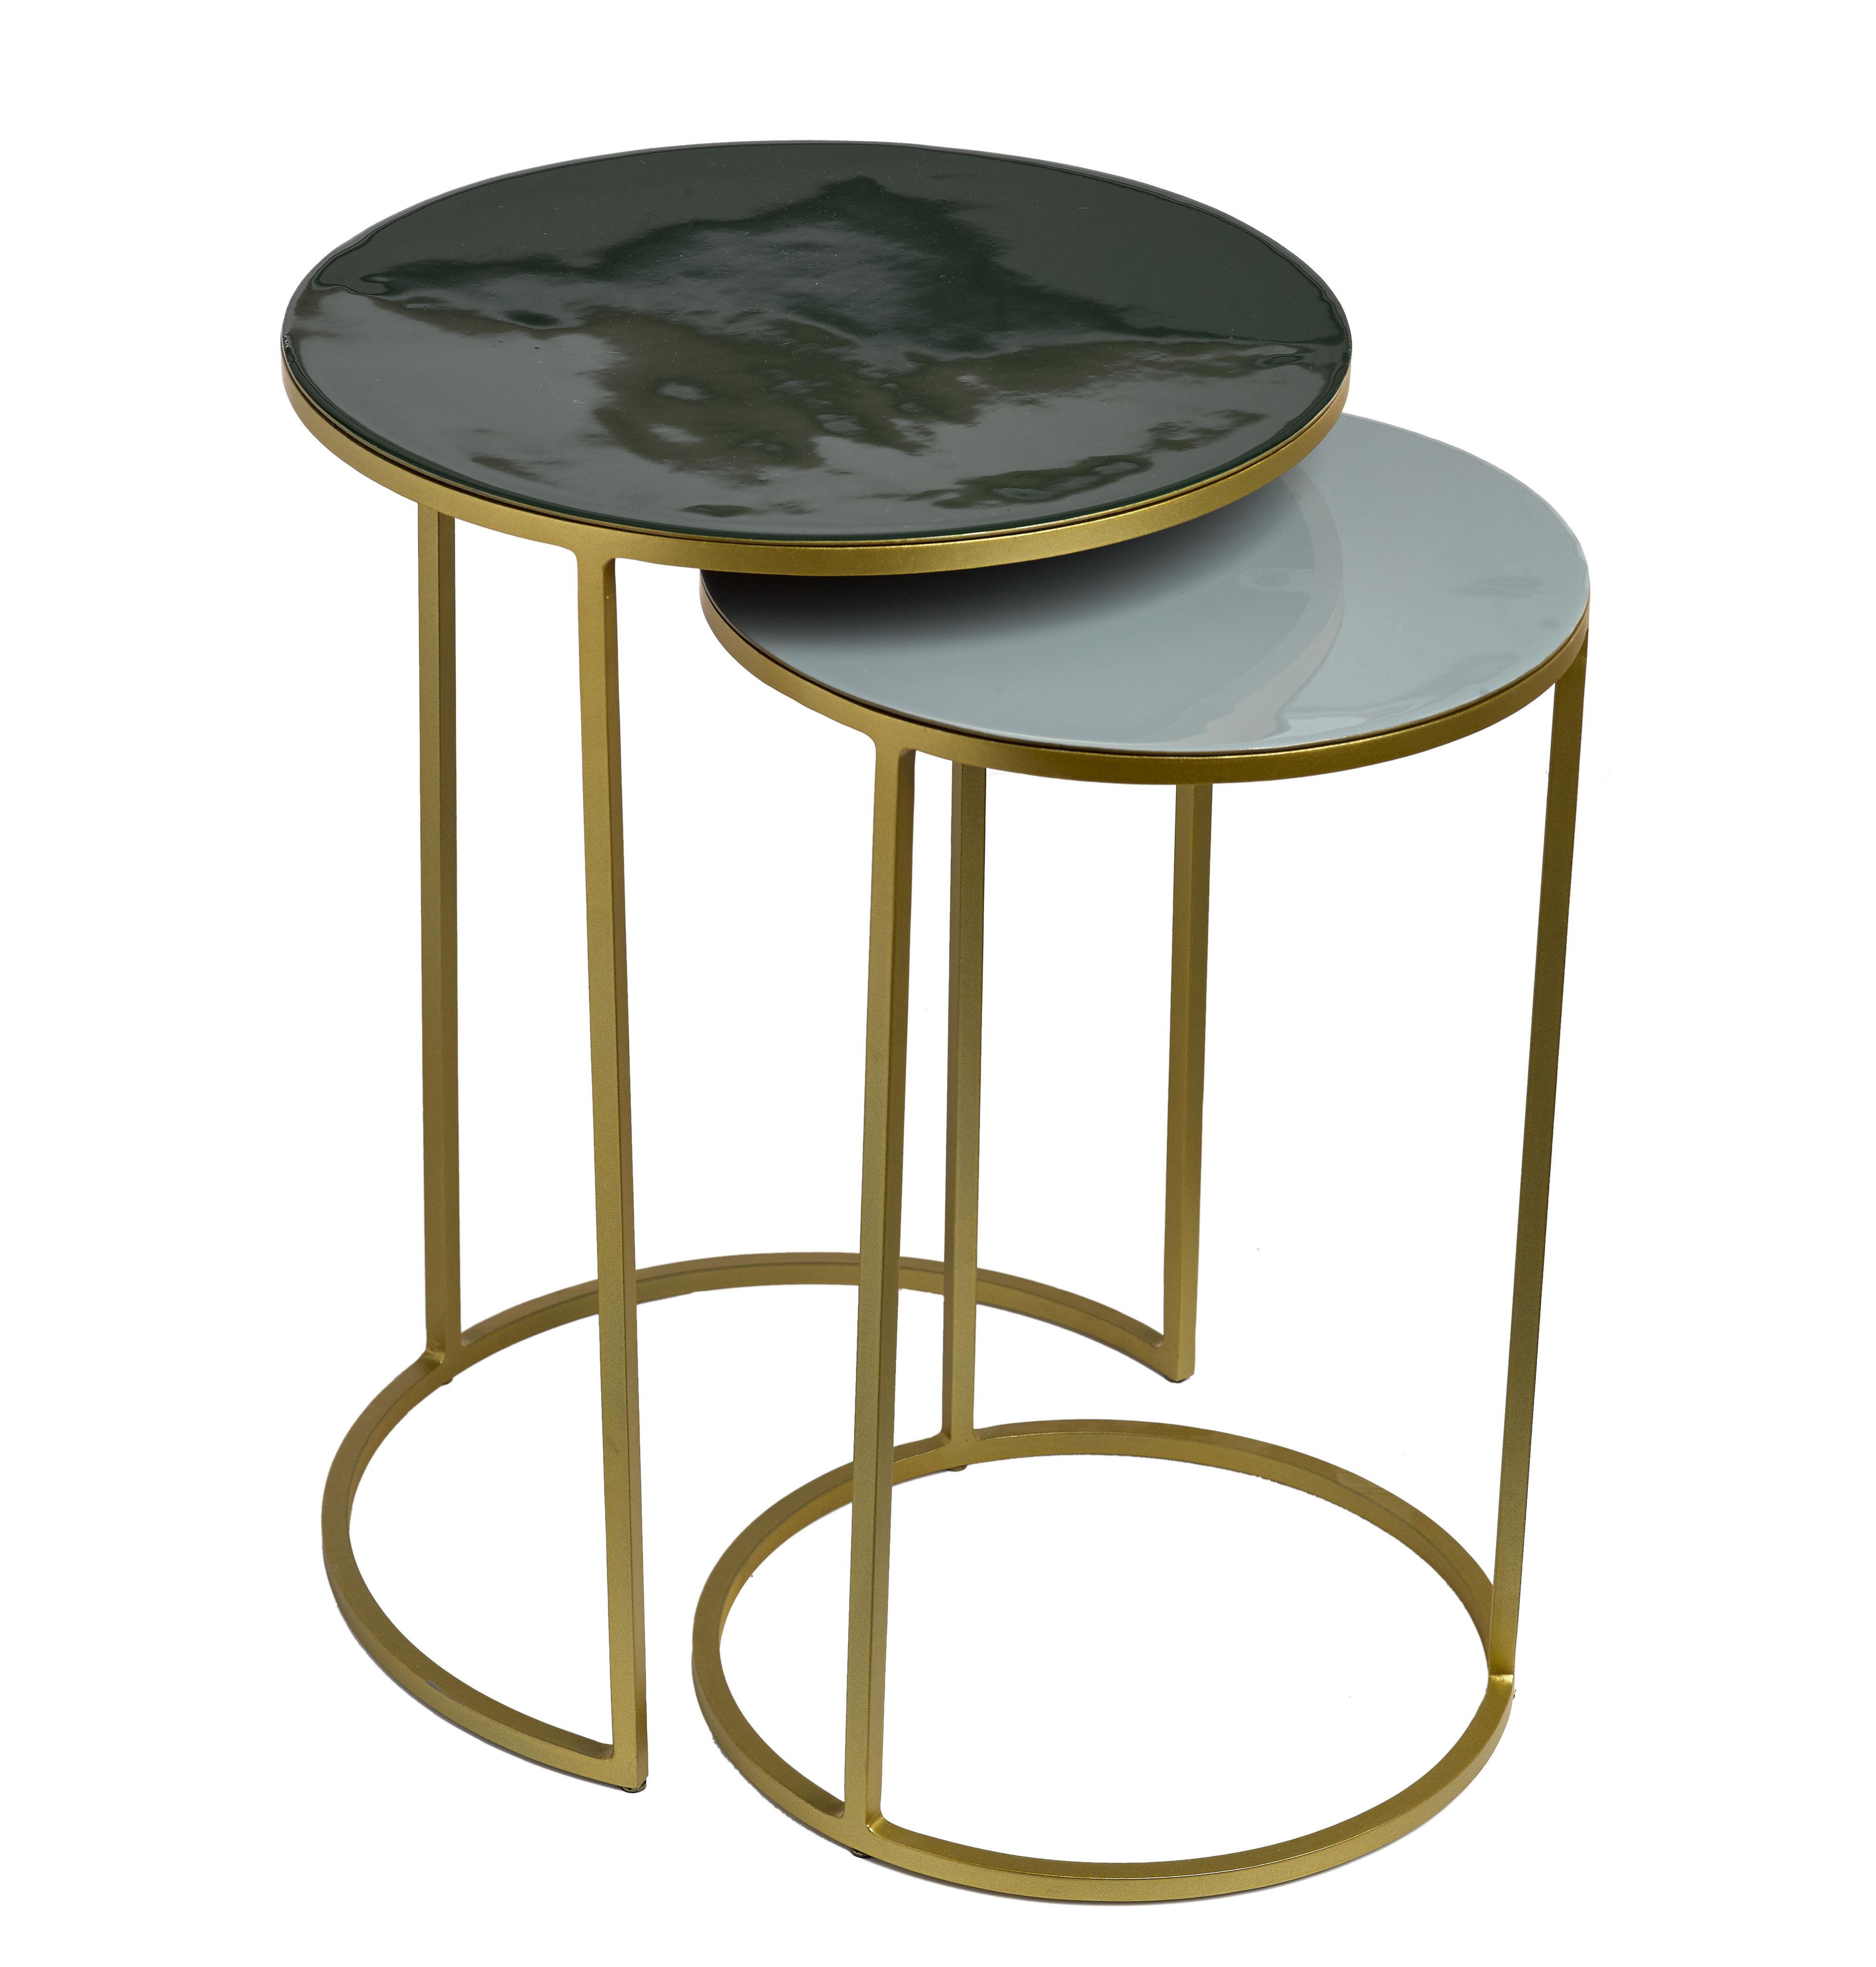 Arredamento - Tavolini  - Tavolino basso Enamel / Set da 2 - Ferro smaltato - Pols Potten - Verde pino & Grigio / Oro - Ferro smaltato, metallo verniciato